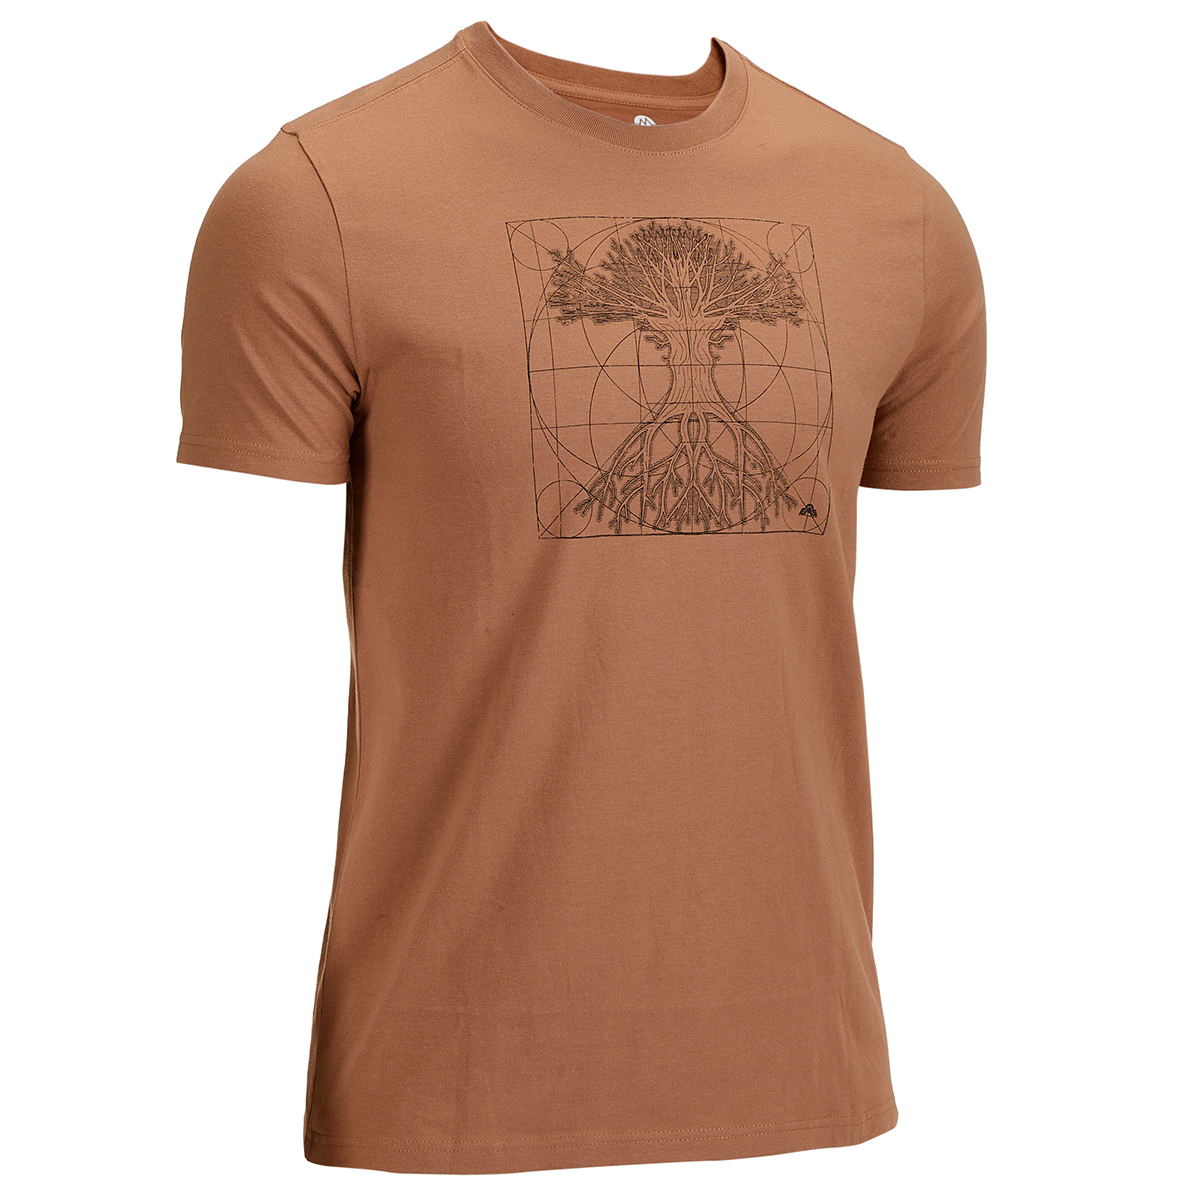 Ems Men's Short-Sleeve Graphic Tee - Brown, M